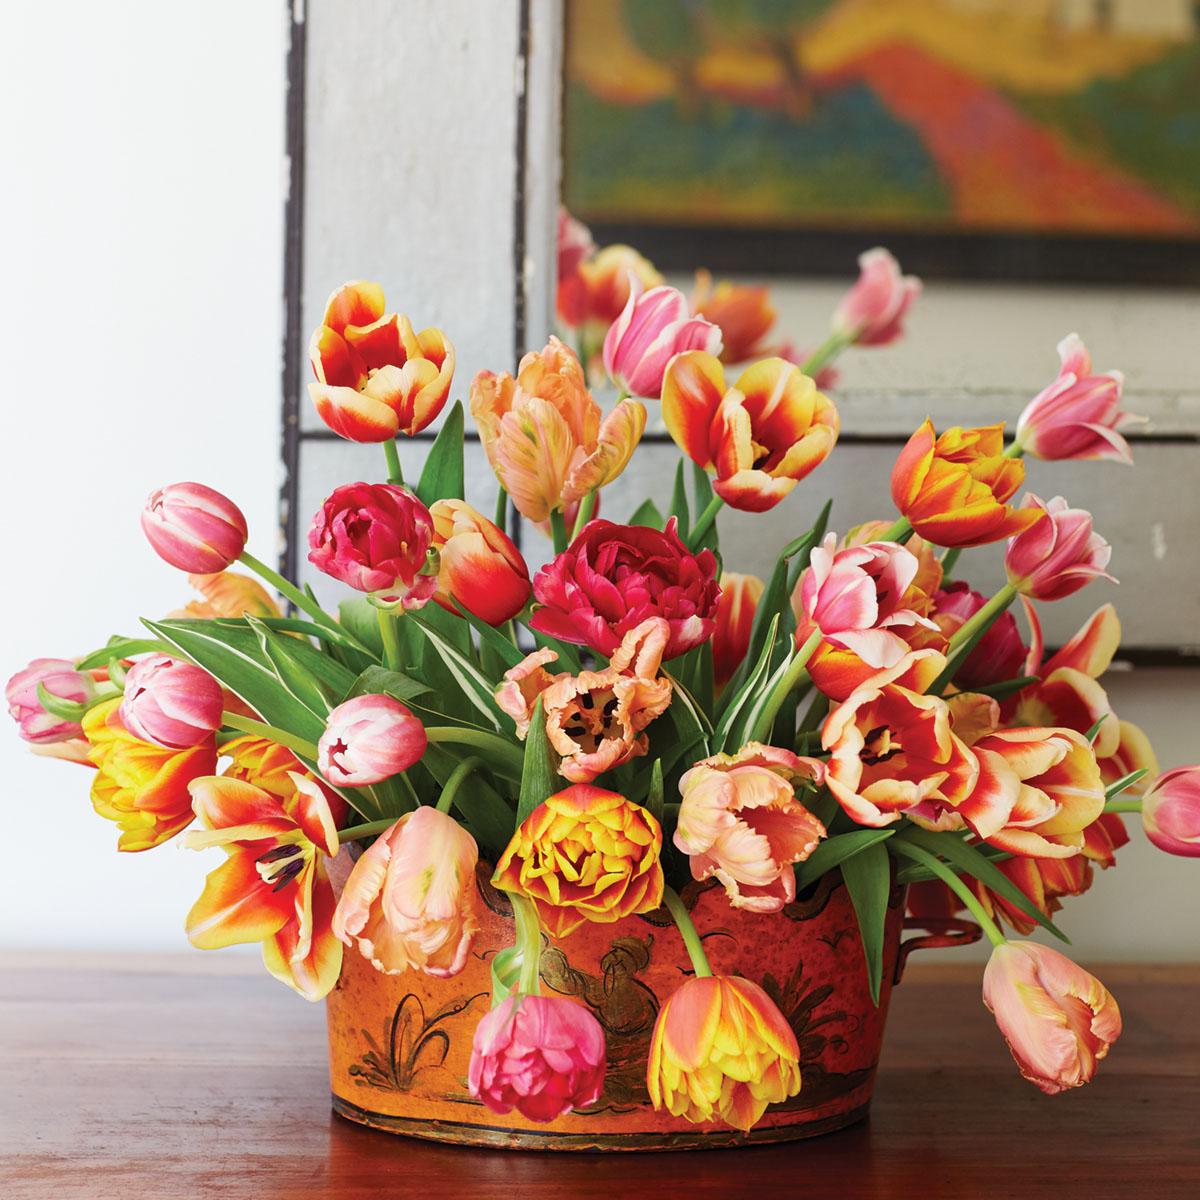 A simple tulip arrangement by floral designer Mimi Brown in a tole cachepot